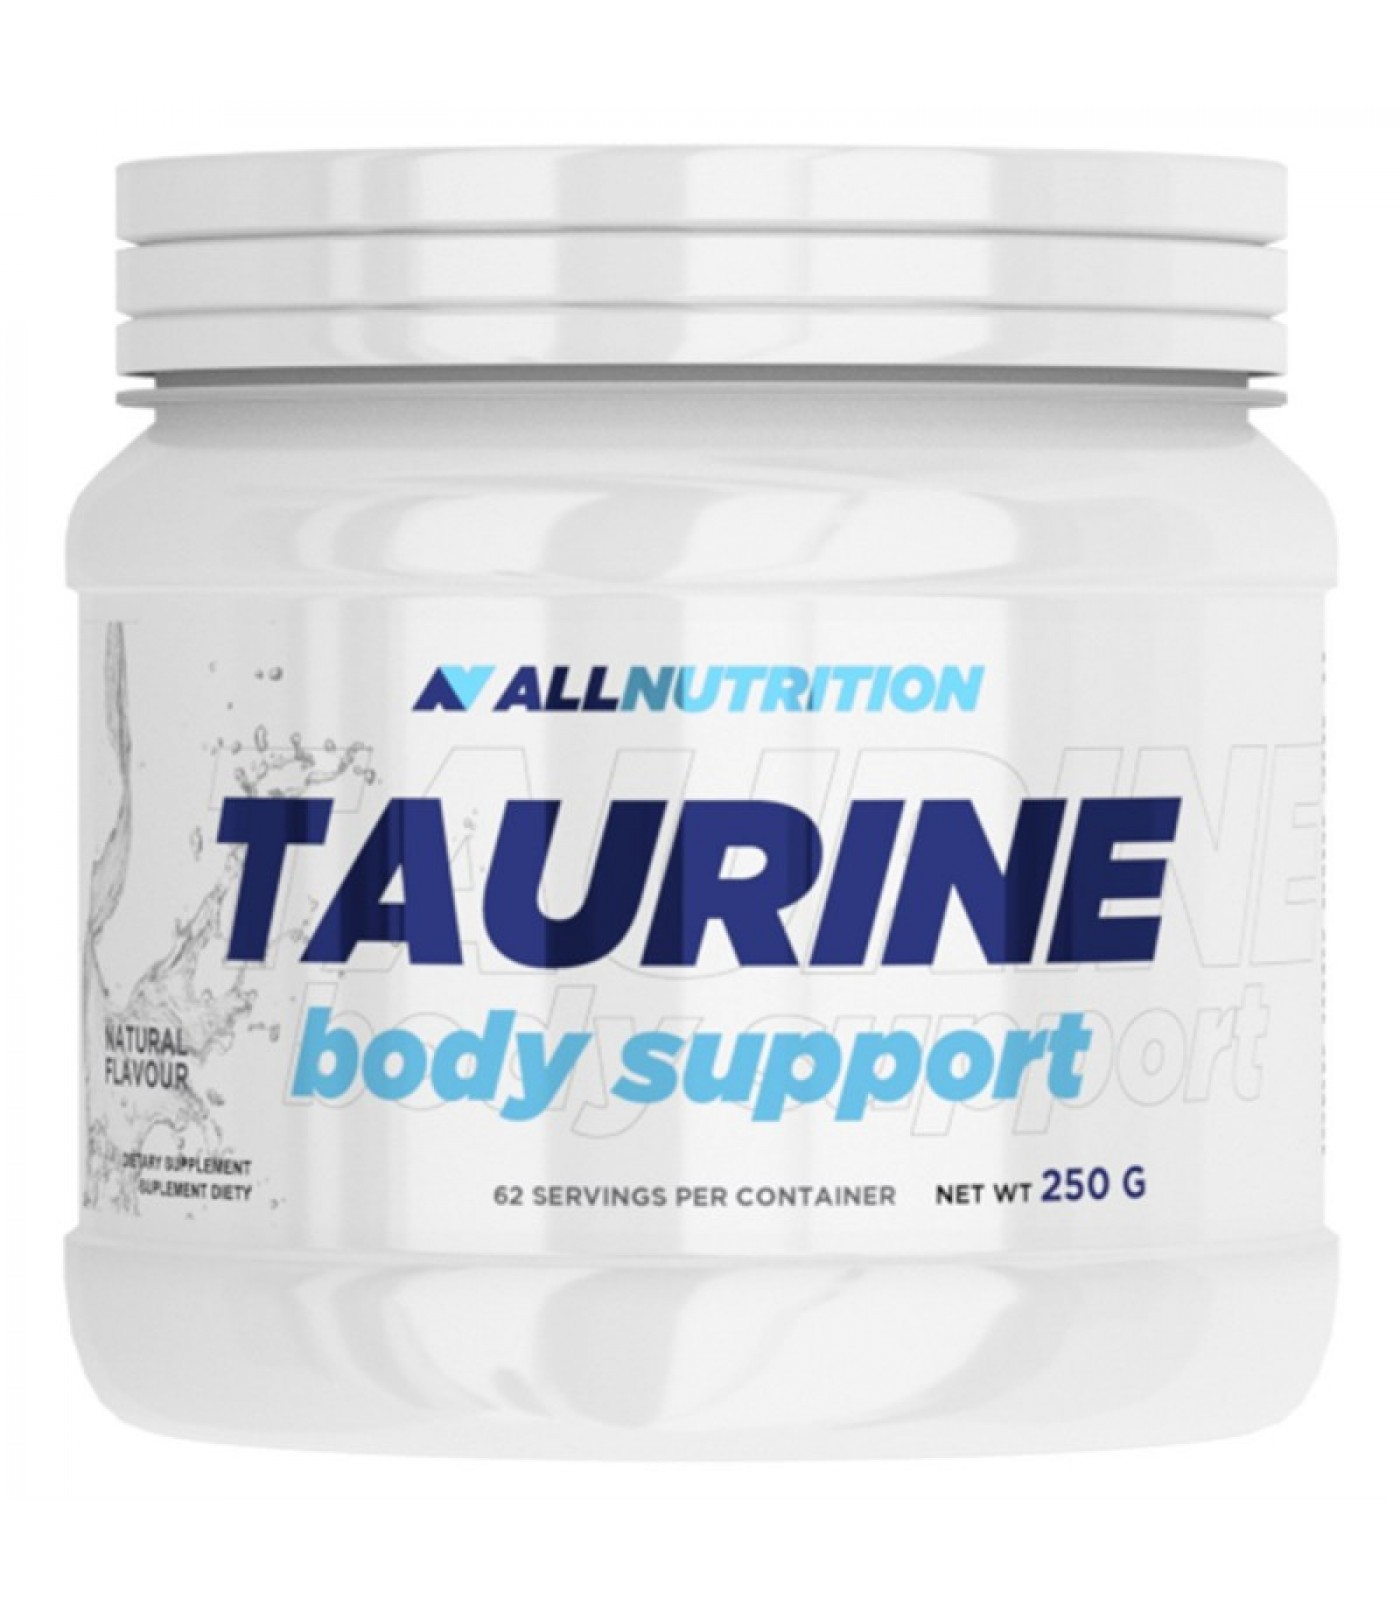 Allnutrition Taurine